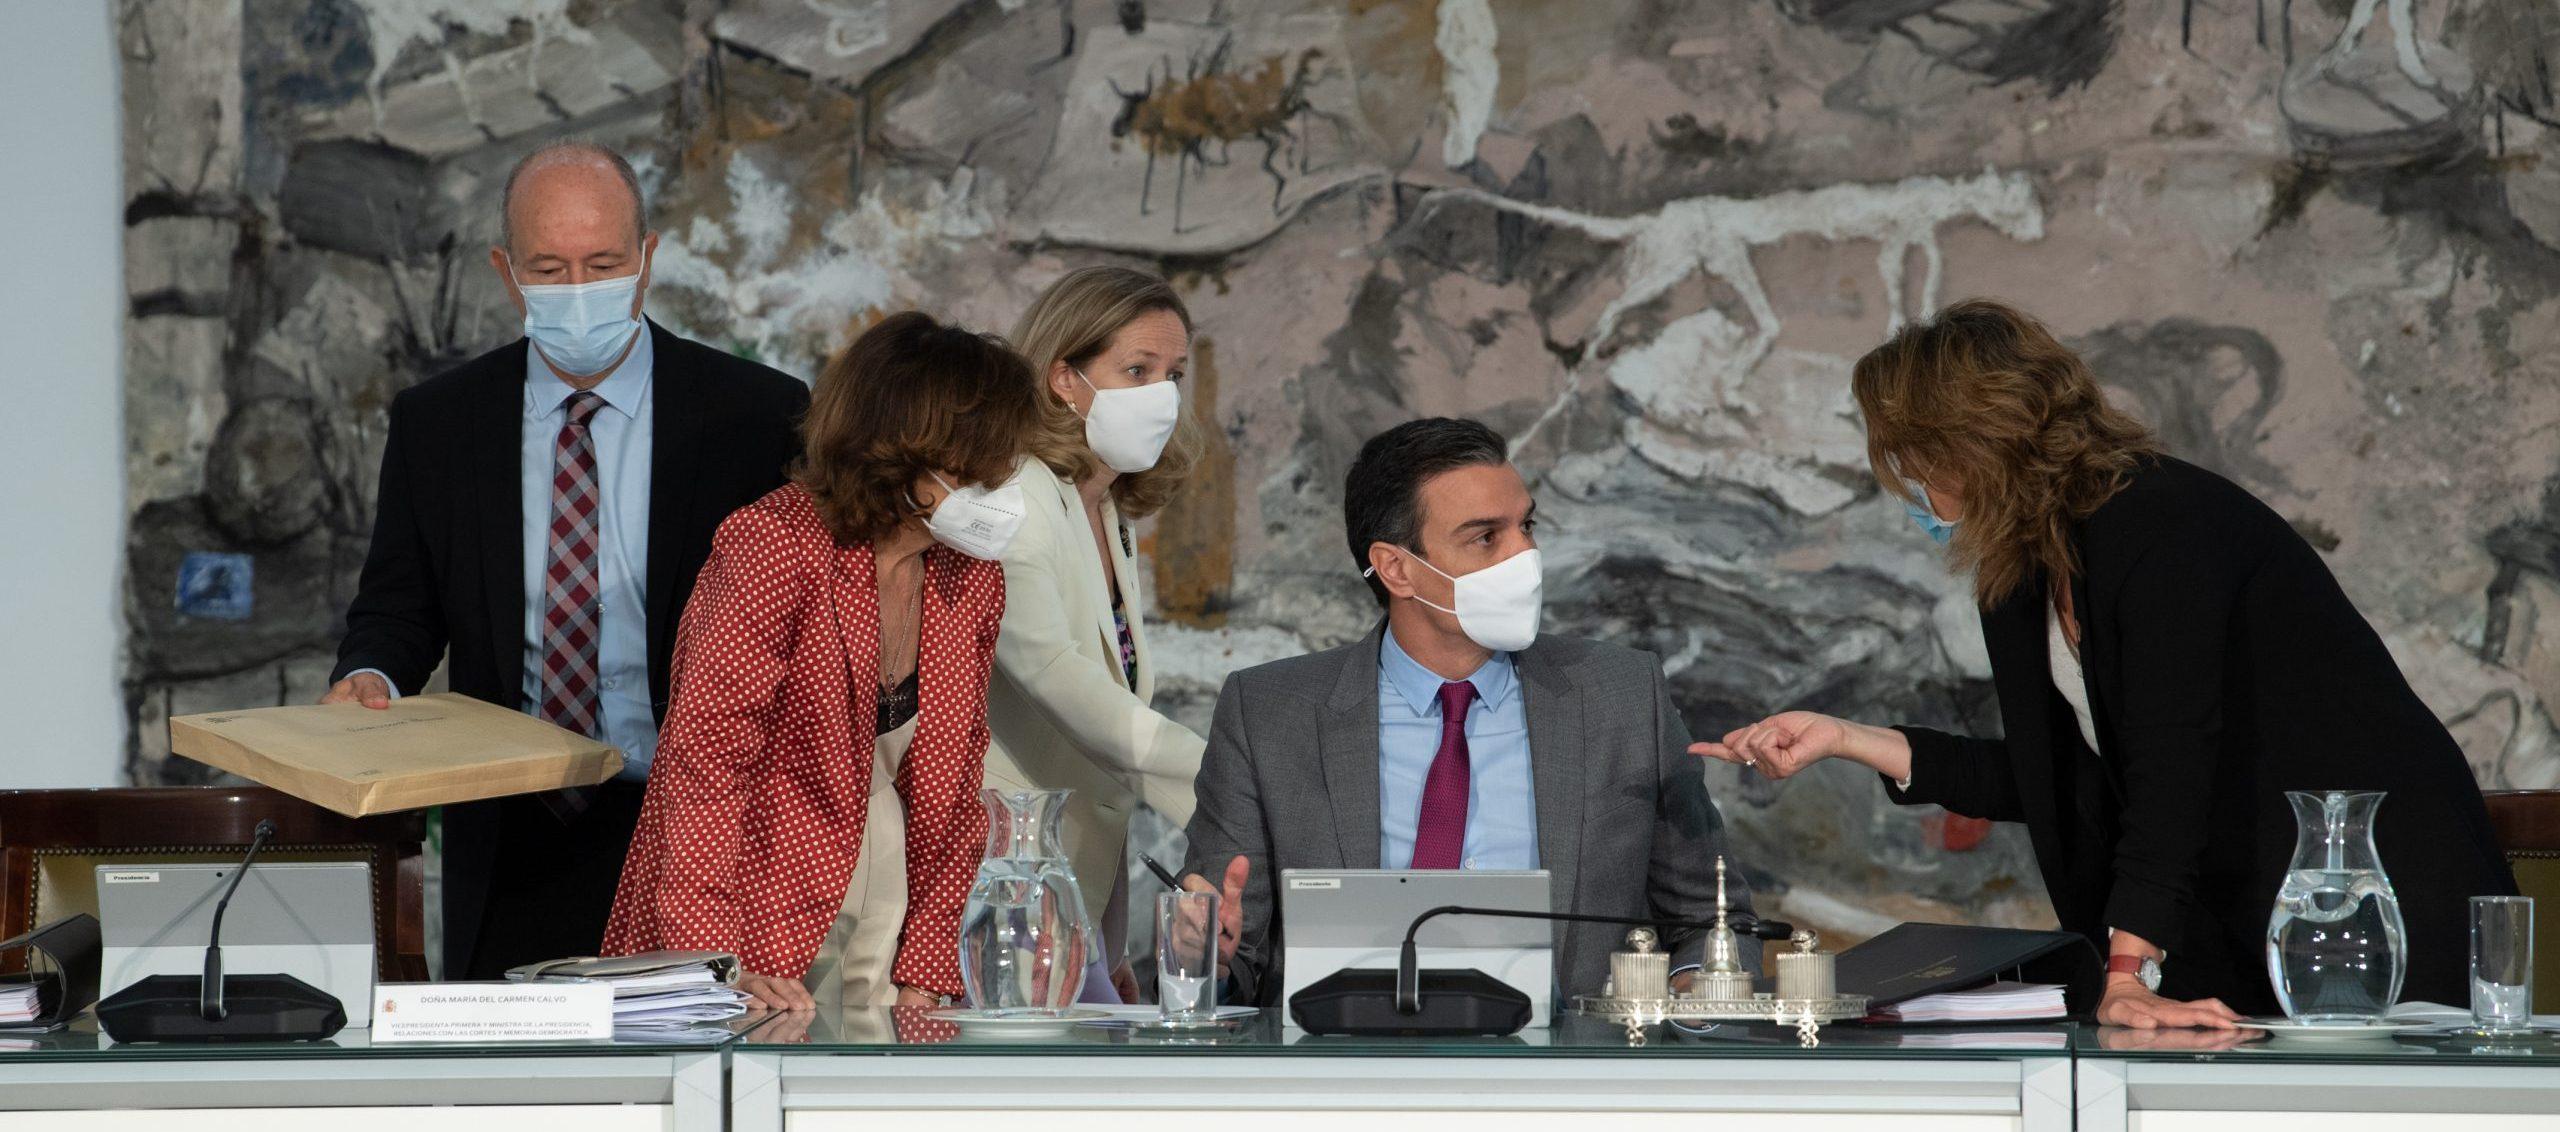 El president espanyol, Pedro Sánchez, en l'acte del Liceu, ahir / DAVID ZORRAKINO / EUROPA PRESS